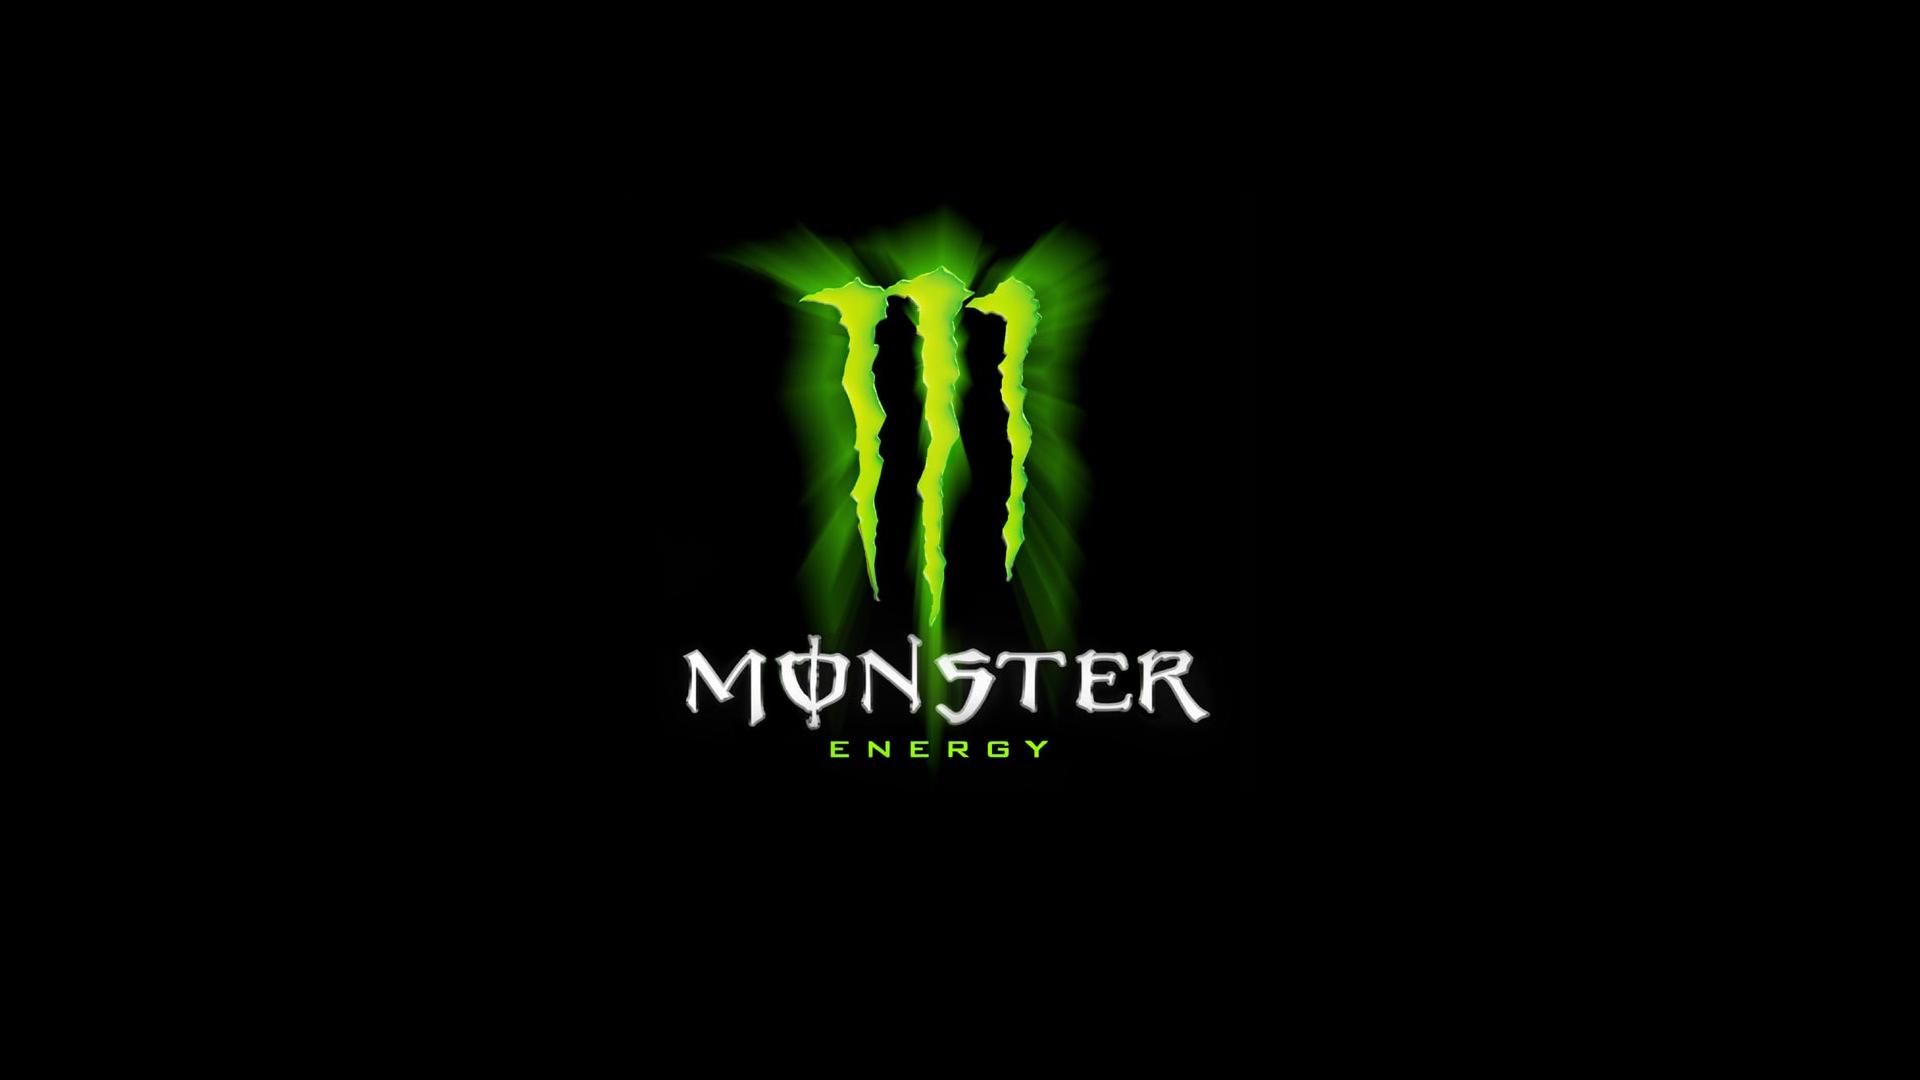 Description Monster Energy Logo Wallpaper is a hi res Wallpaper for 1920x1080